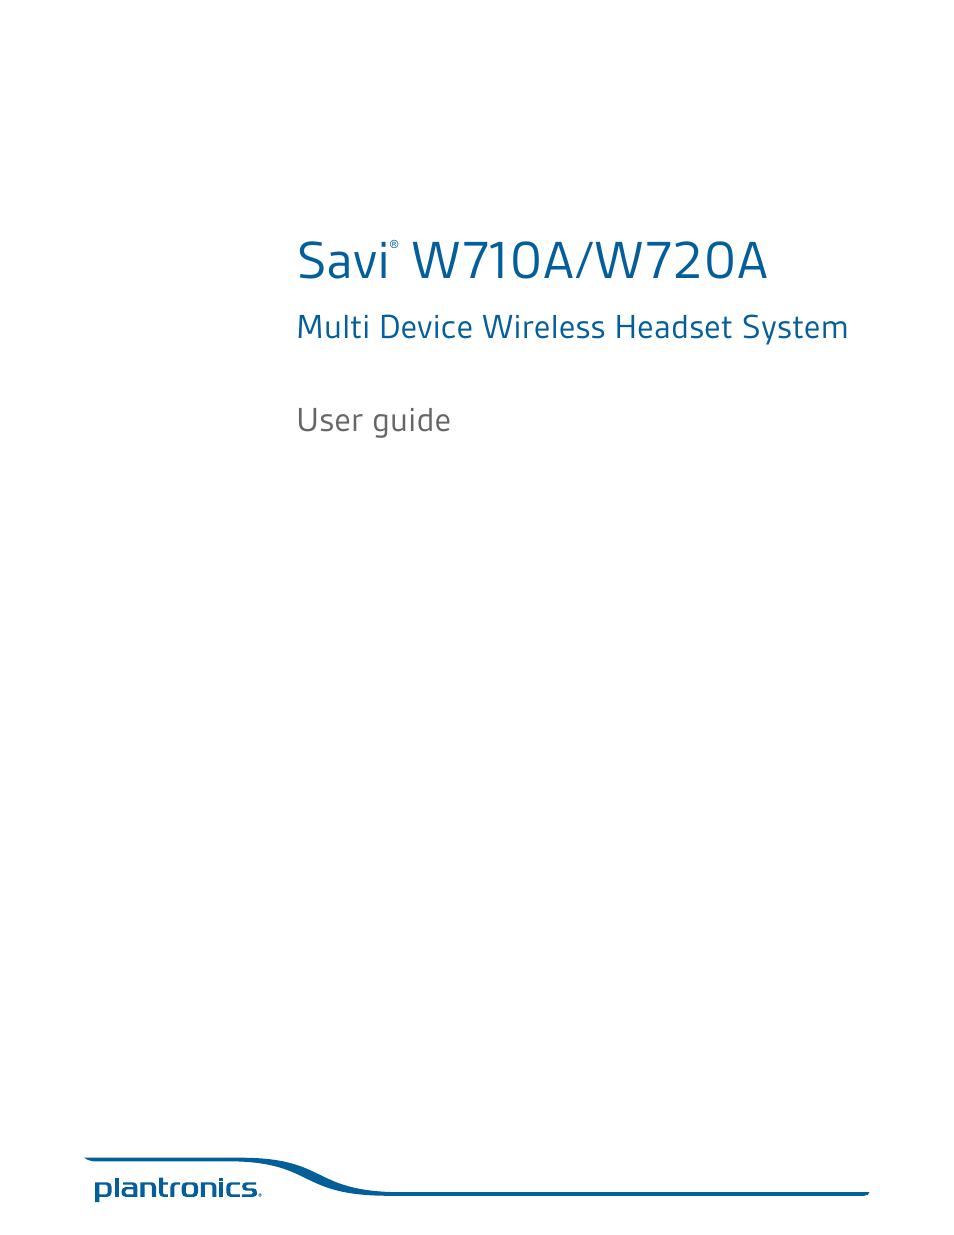 Plantronics Savi W720 User Manual 36 Pages